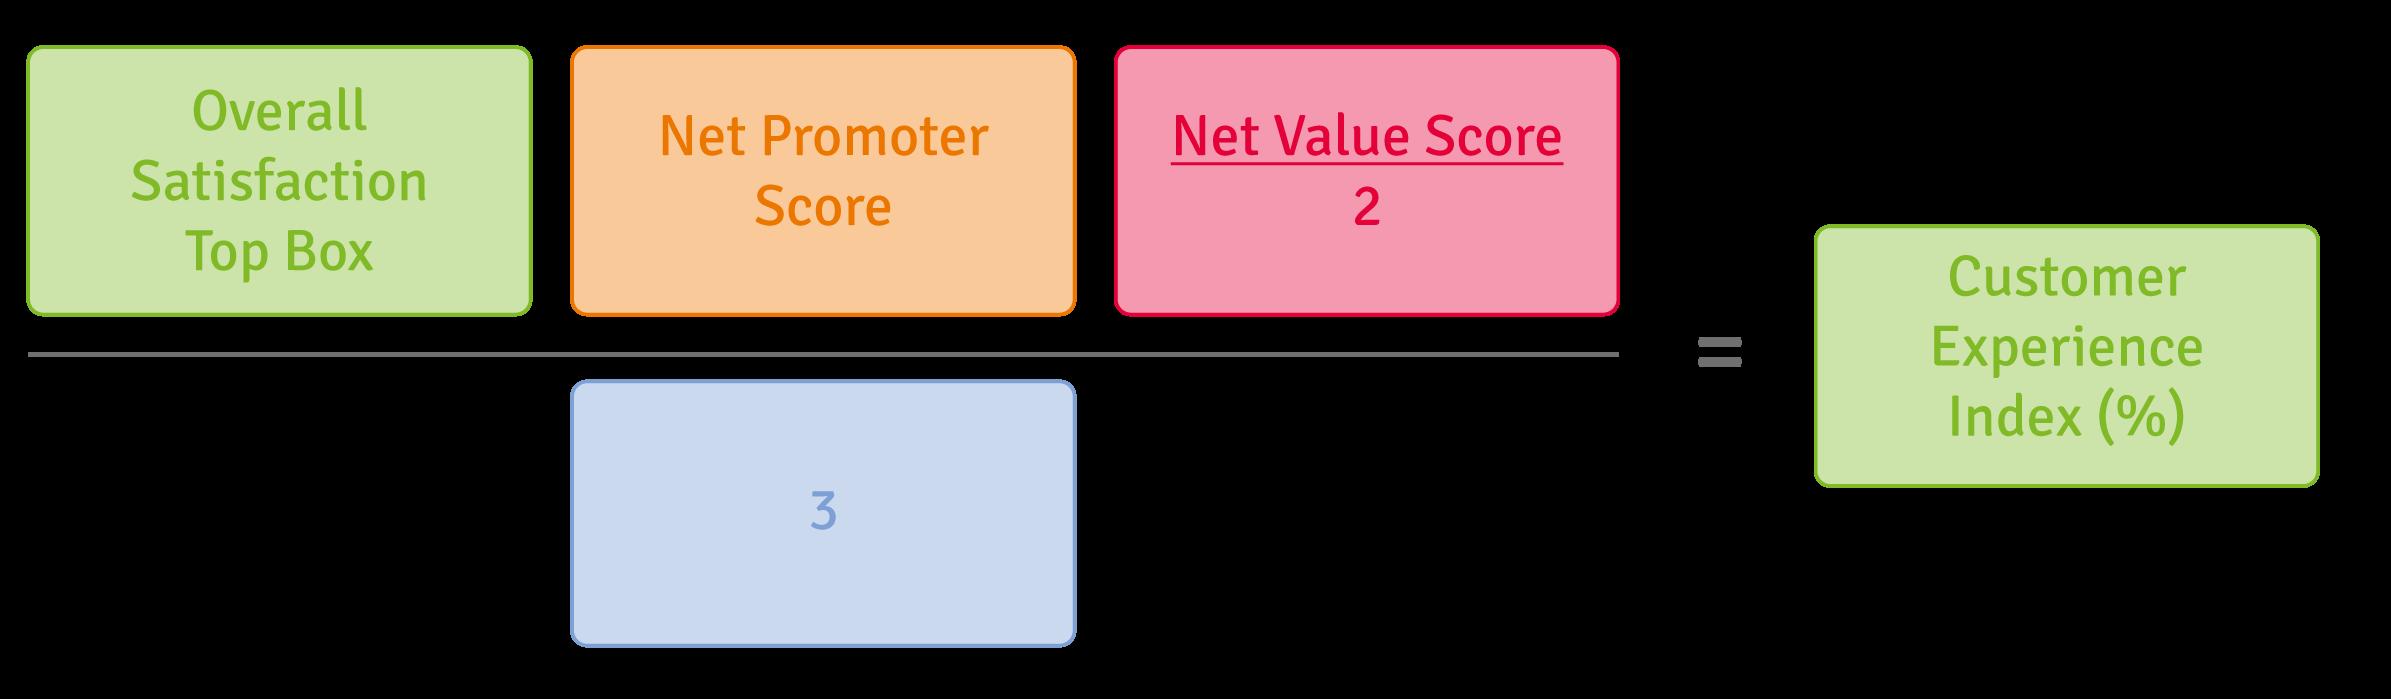 Customer Experience Index